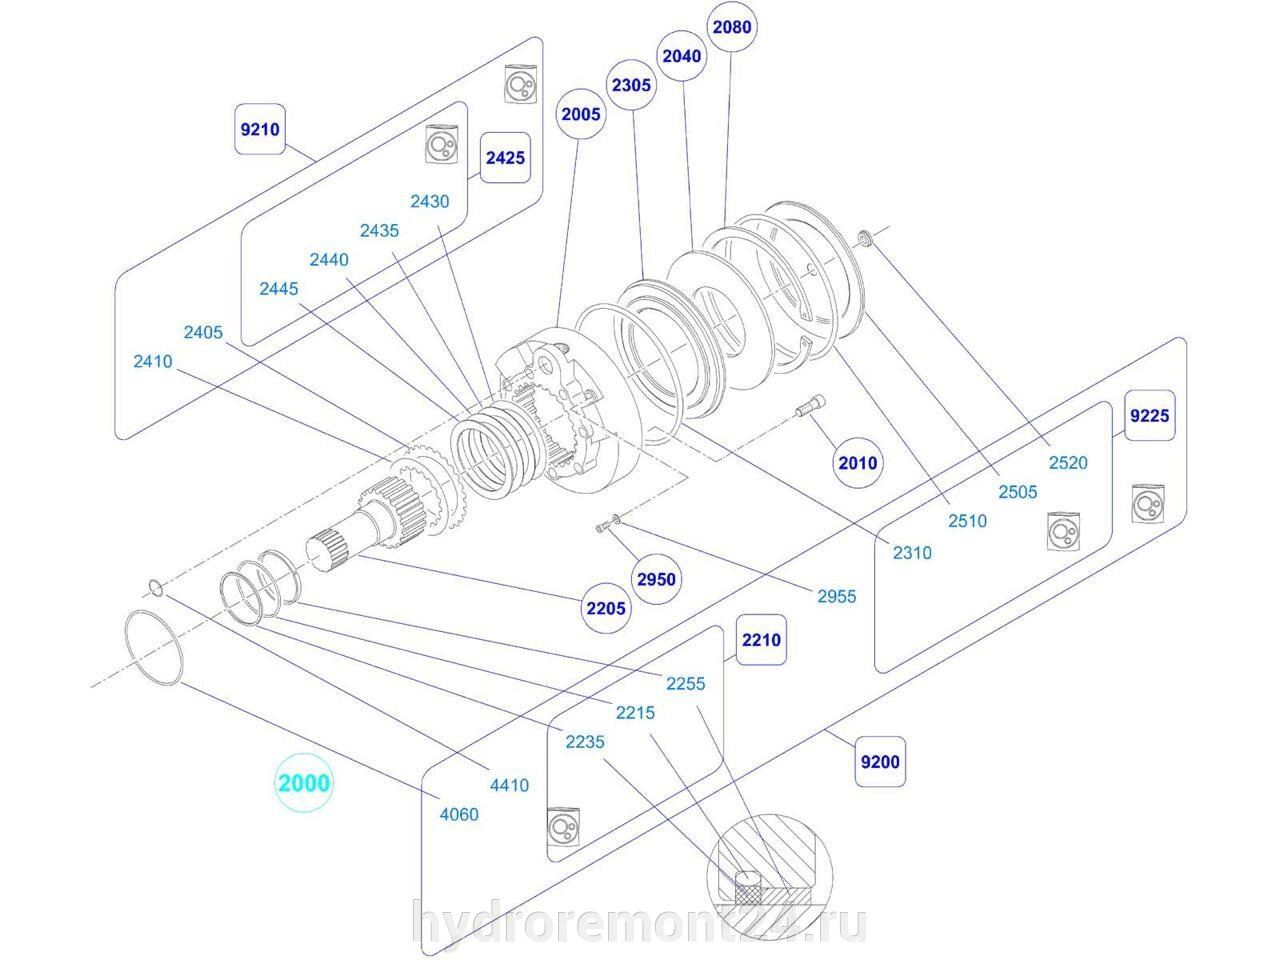 Запасные части Poclain - фото pic_ba471164bf96125ca811b9e5730260b6_1920x9000_1.jpg